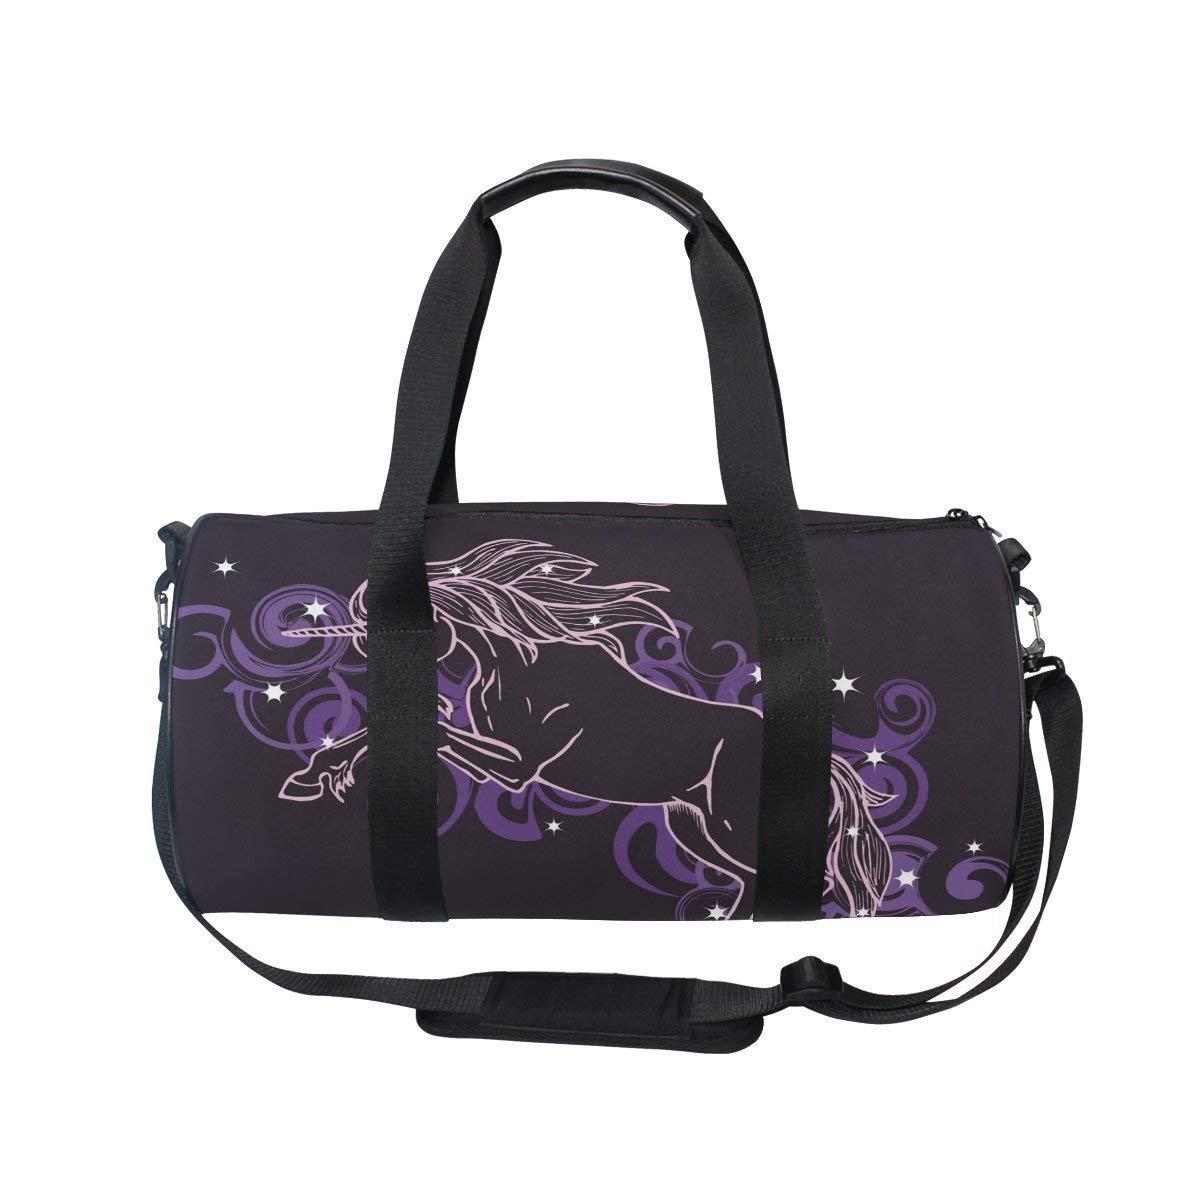 Gym Duffel Bag Unicorn Star Cloud Sports Lightweight Canvas Travel Luggage Bag by KMAND (Image #2)